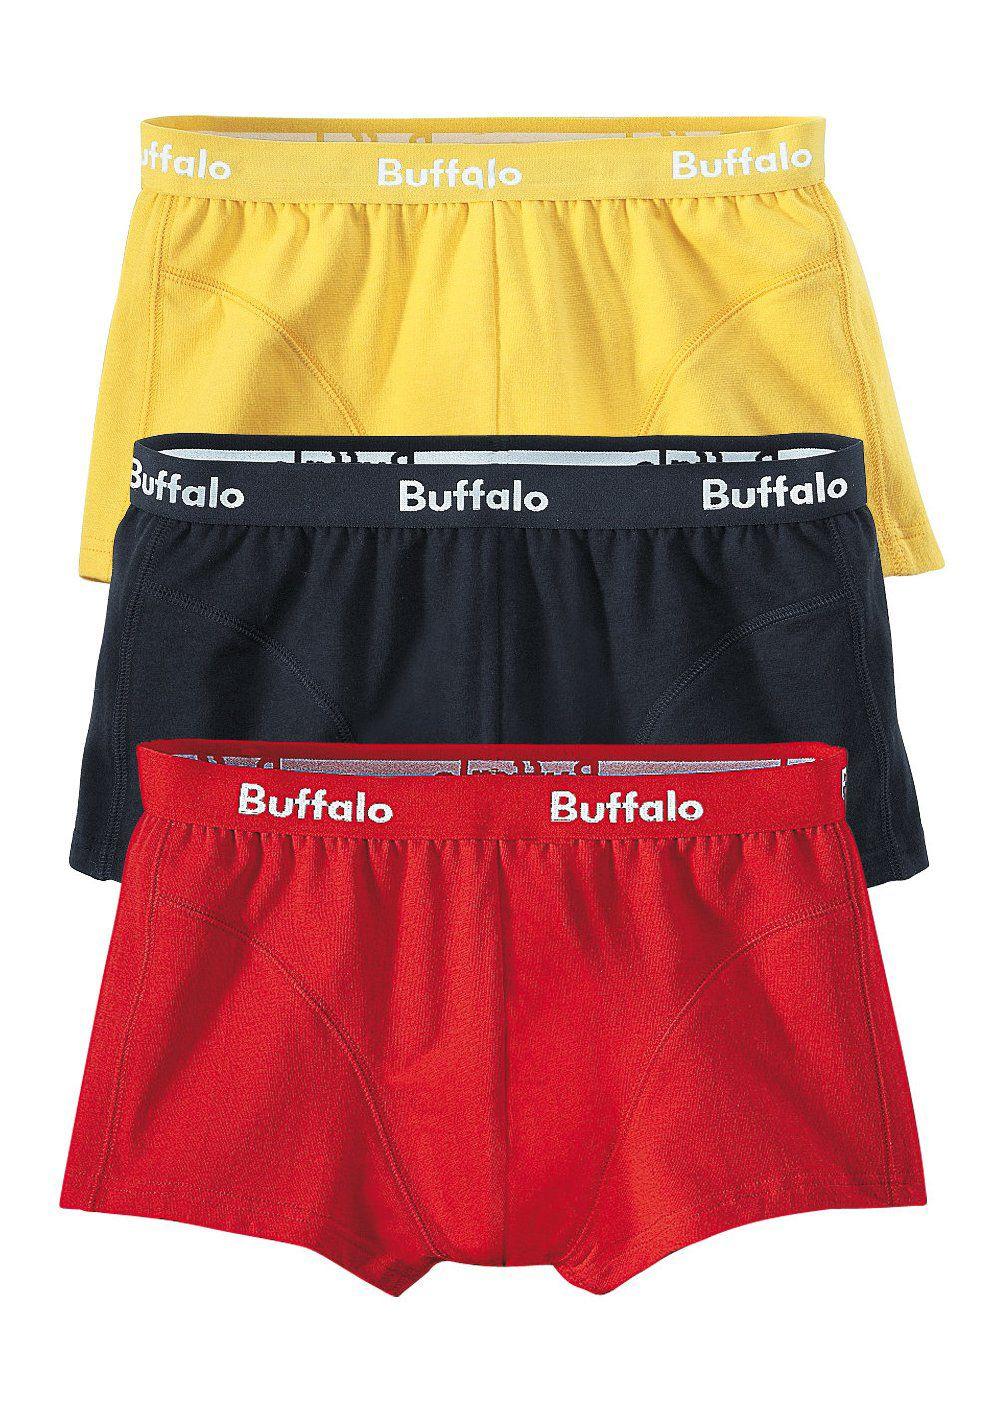 BUFFALO Buffalo Boxer (3 Stück) in Baumwoll- Stretch- Qualität